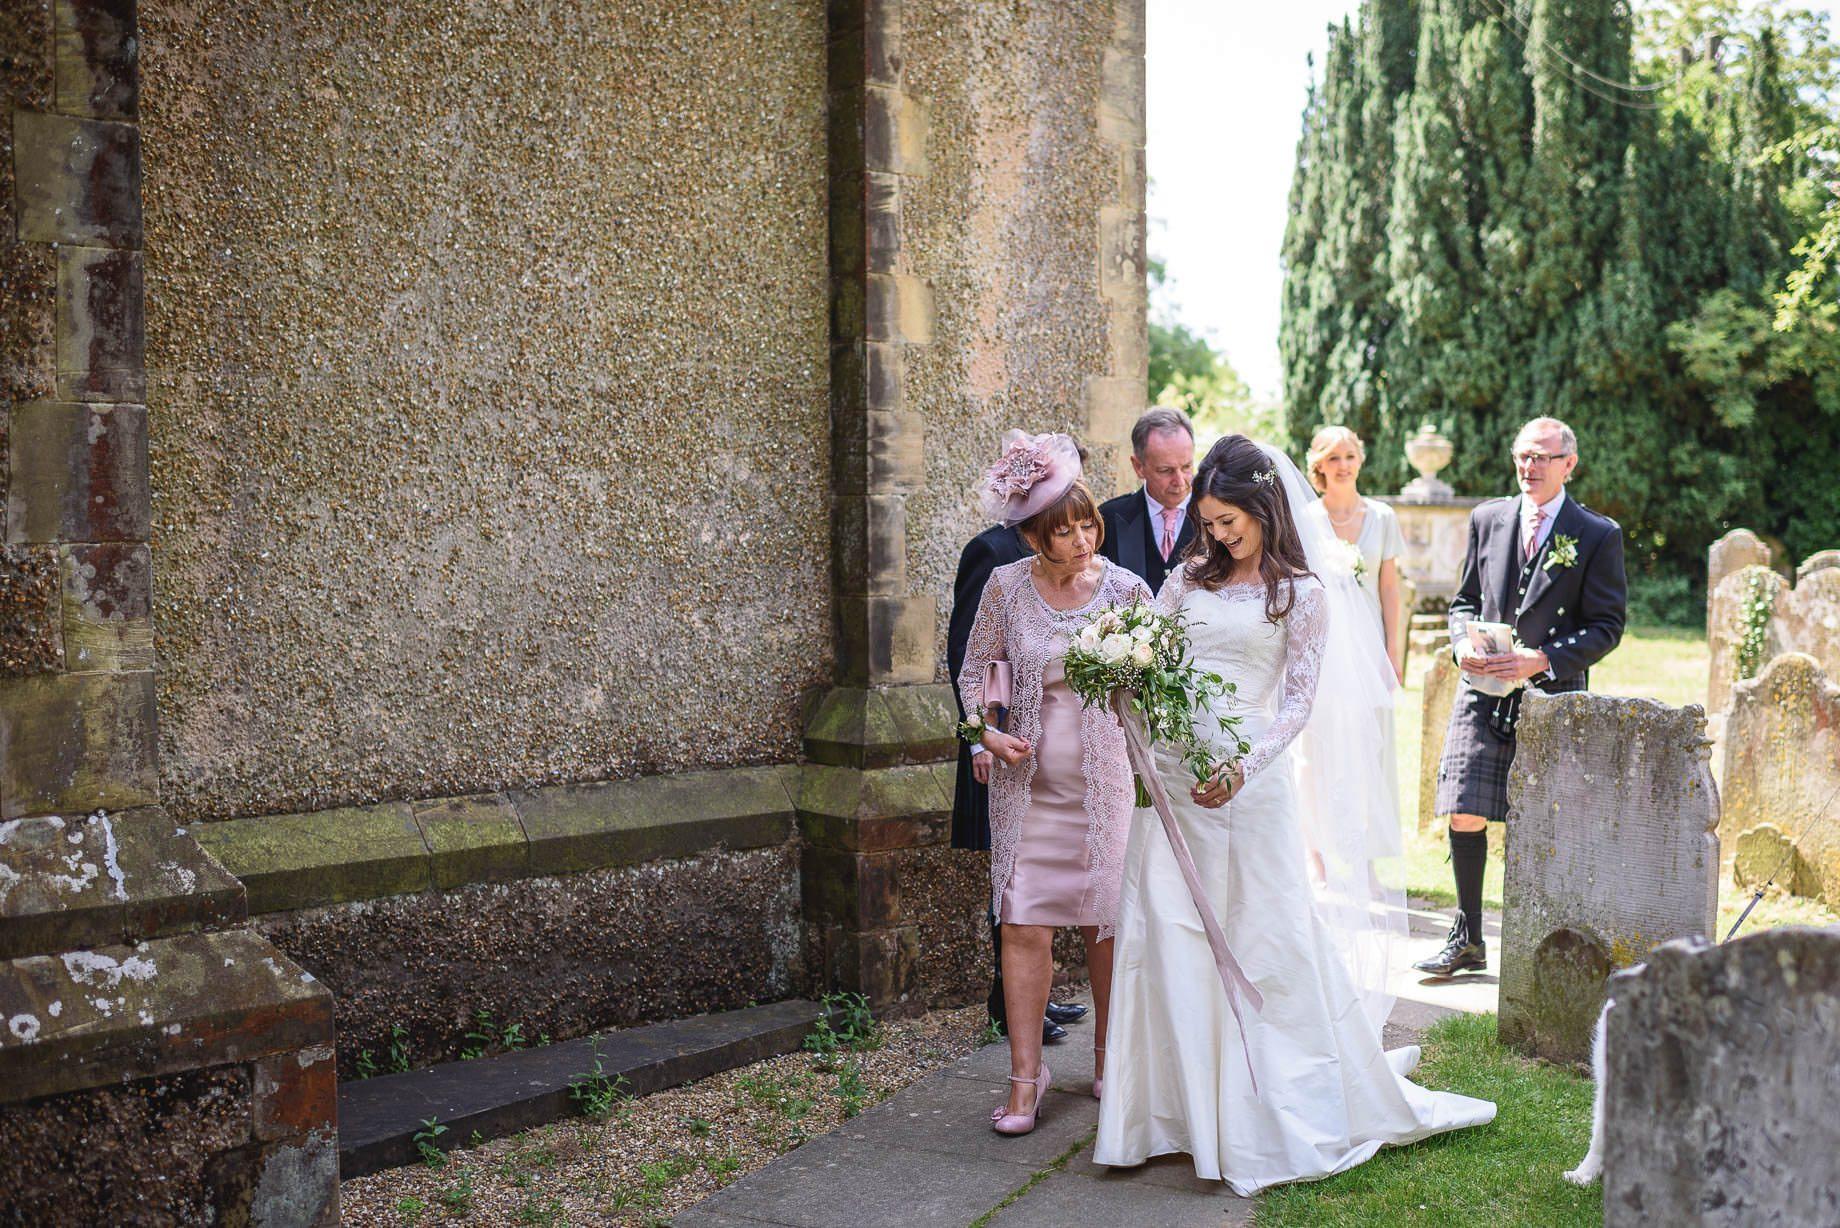 Gildings Barn wedding photography - Sarah and Steve (62 of 190)